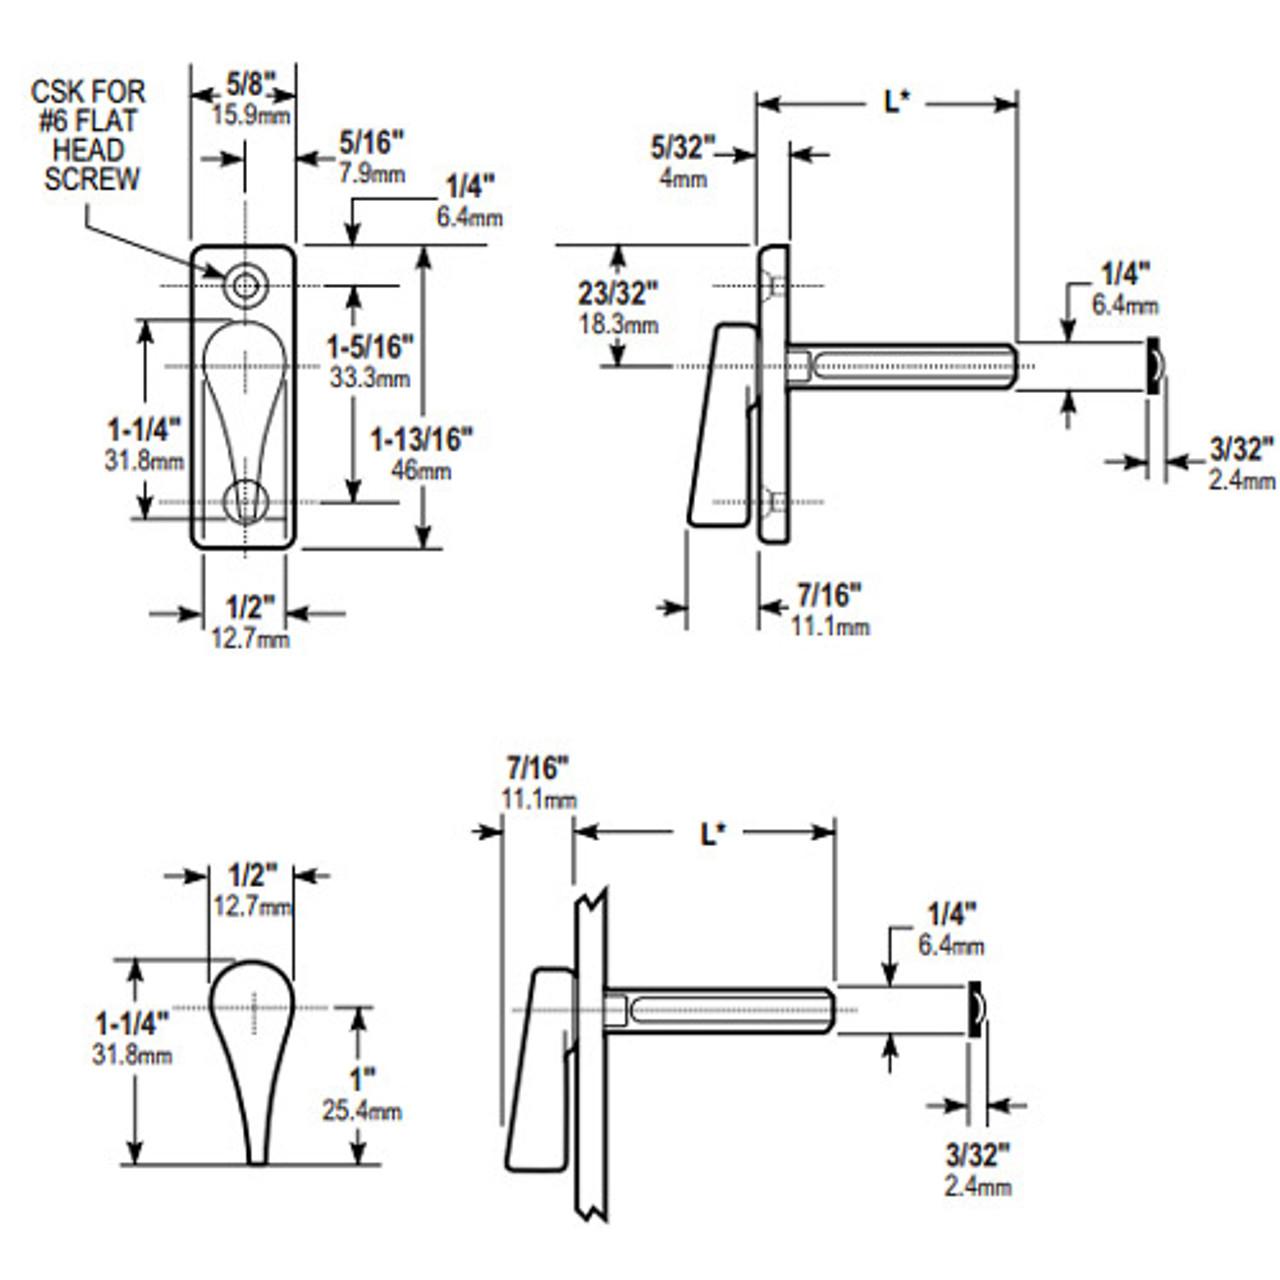 1000-21-28-121 Adams Rite 1000 Series Turns Dimensional View